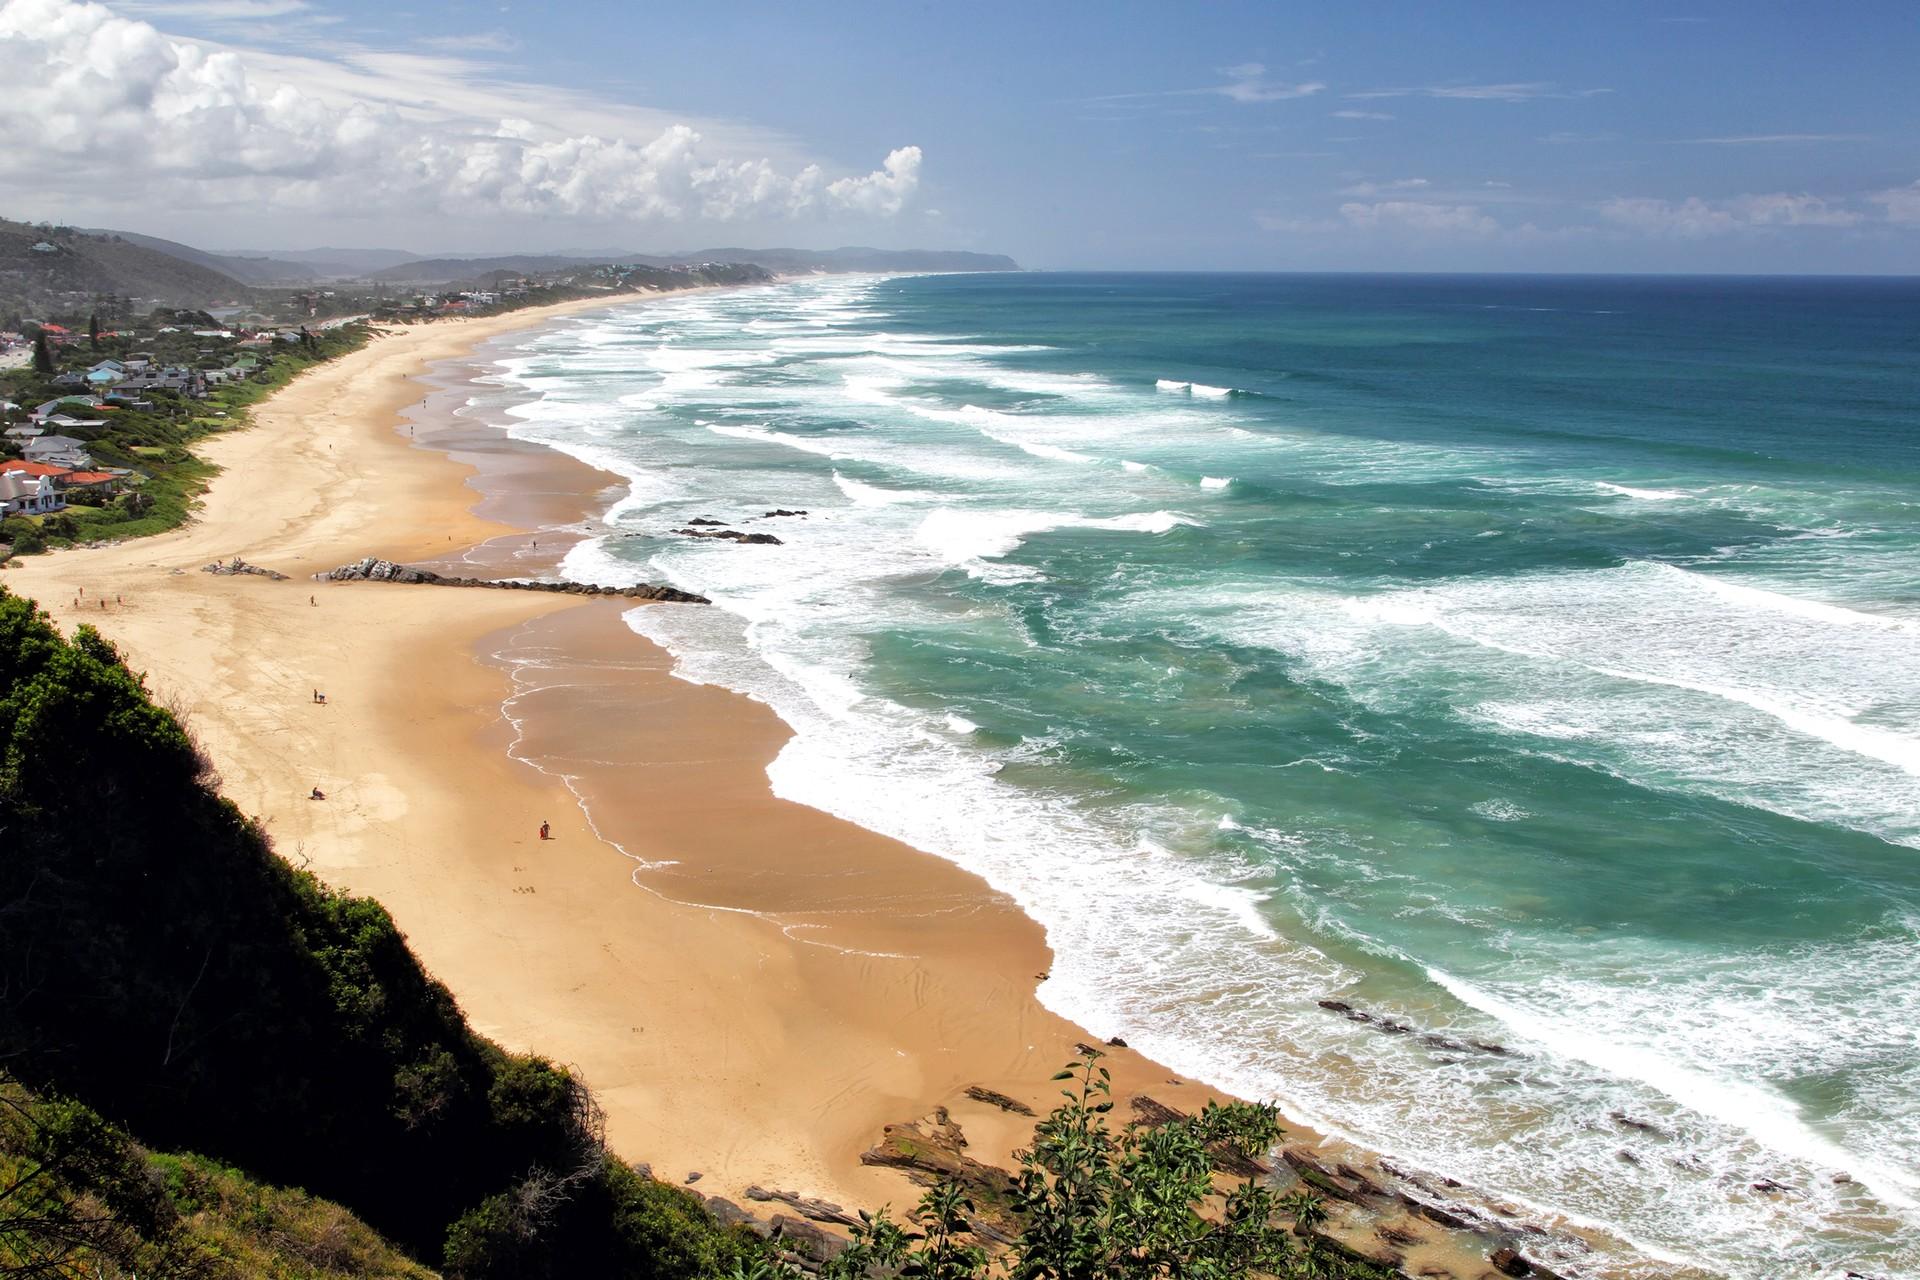 Wilderness beach in South Africa on Garden Route